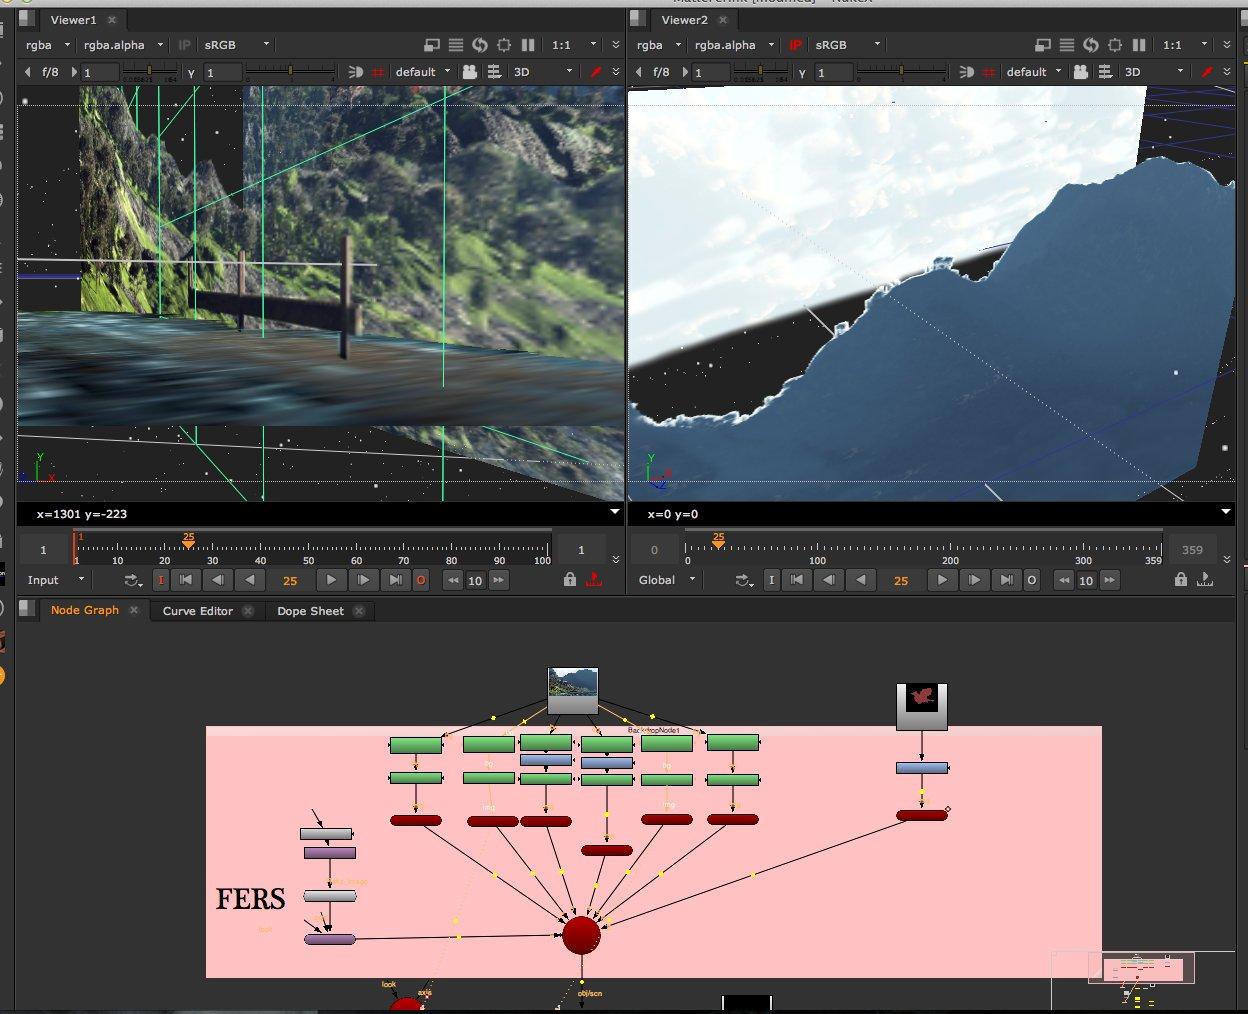 ArtStation - Creating 3D Scene with 2D Image - Nuke